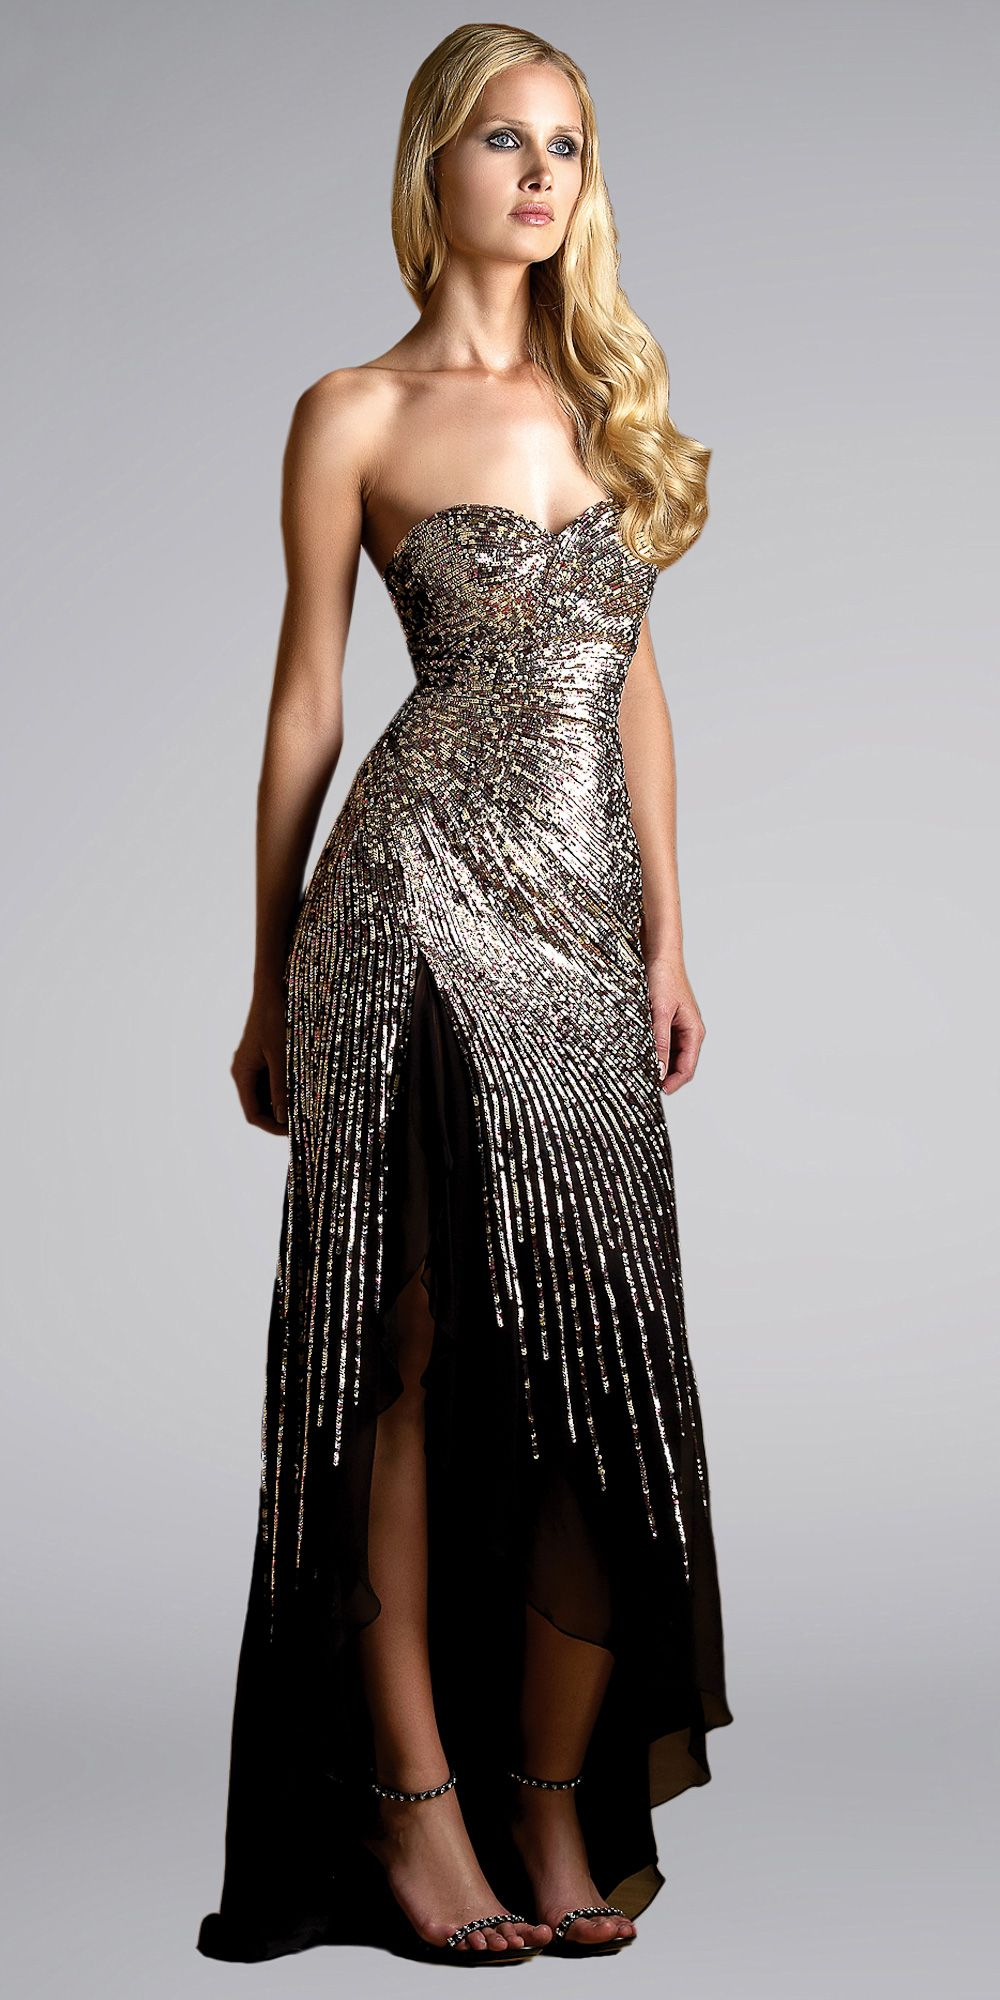 Winter Formal Dresses | Gommap Blog